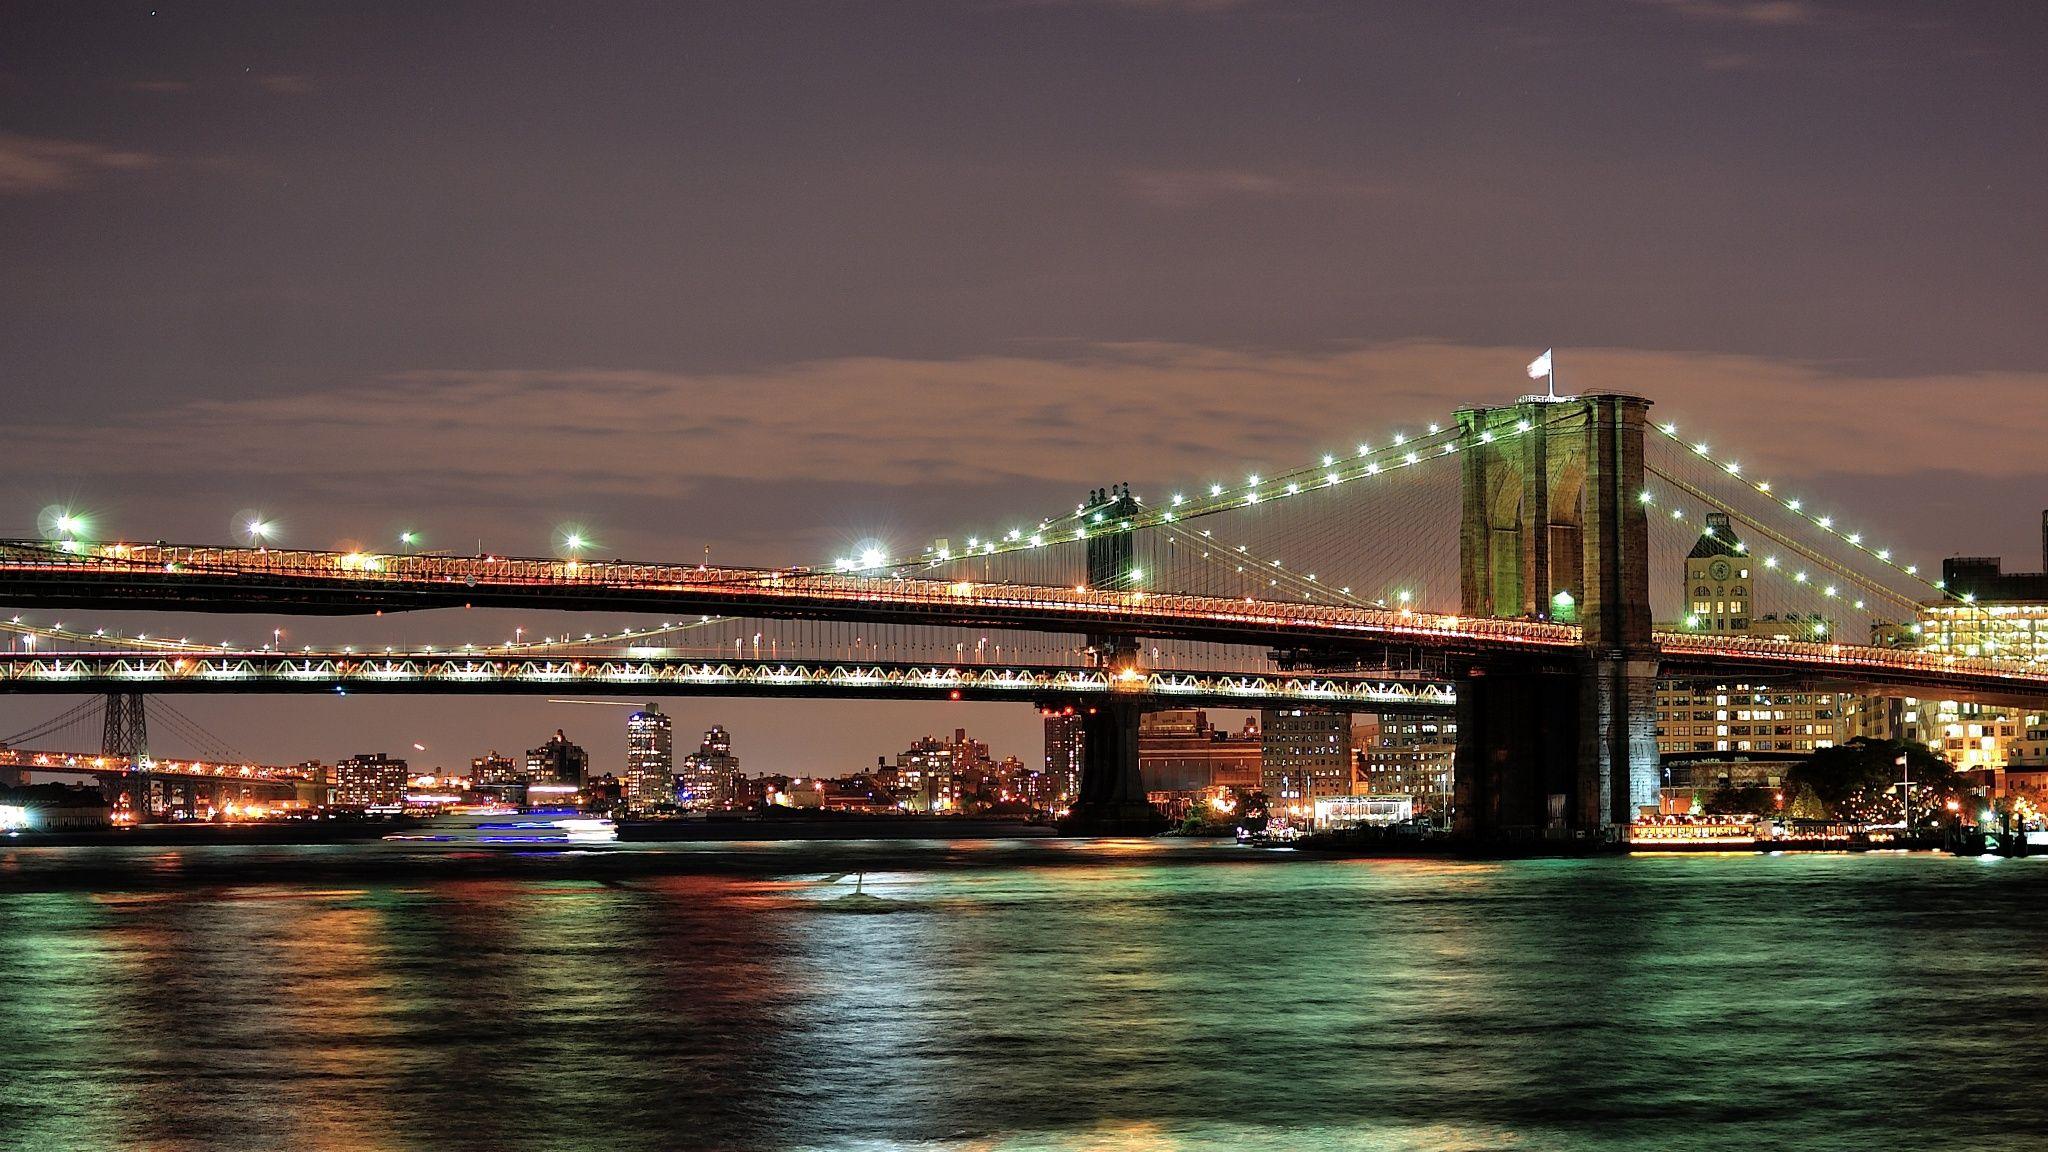 Brooklyn and Manhattan bridges by iveeltbayart on 500px